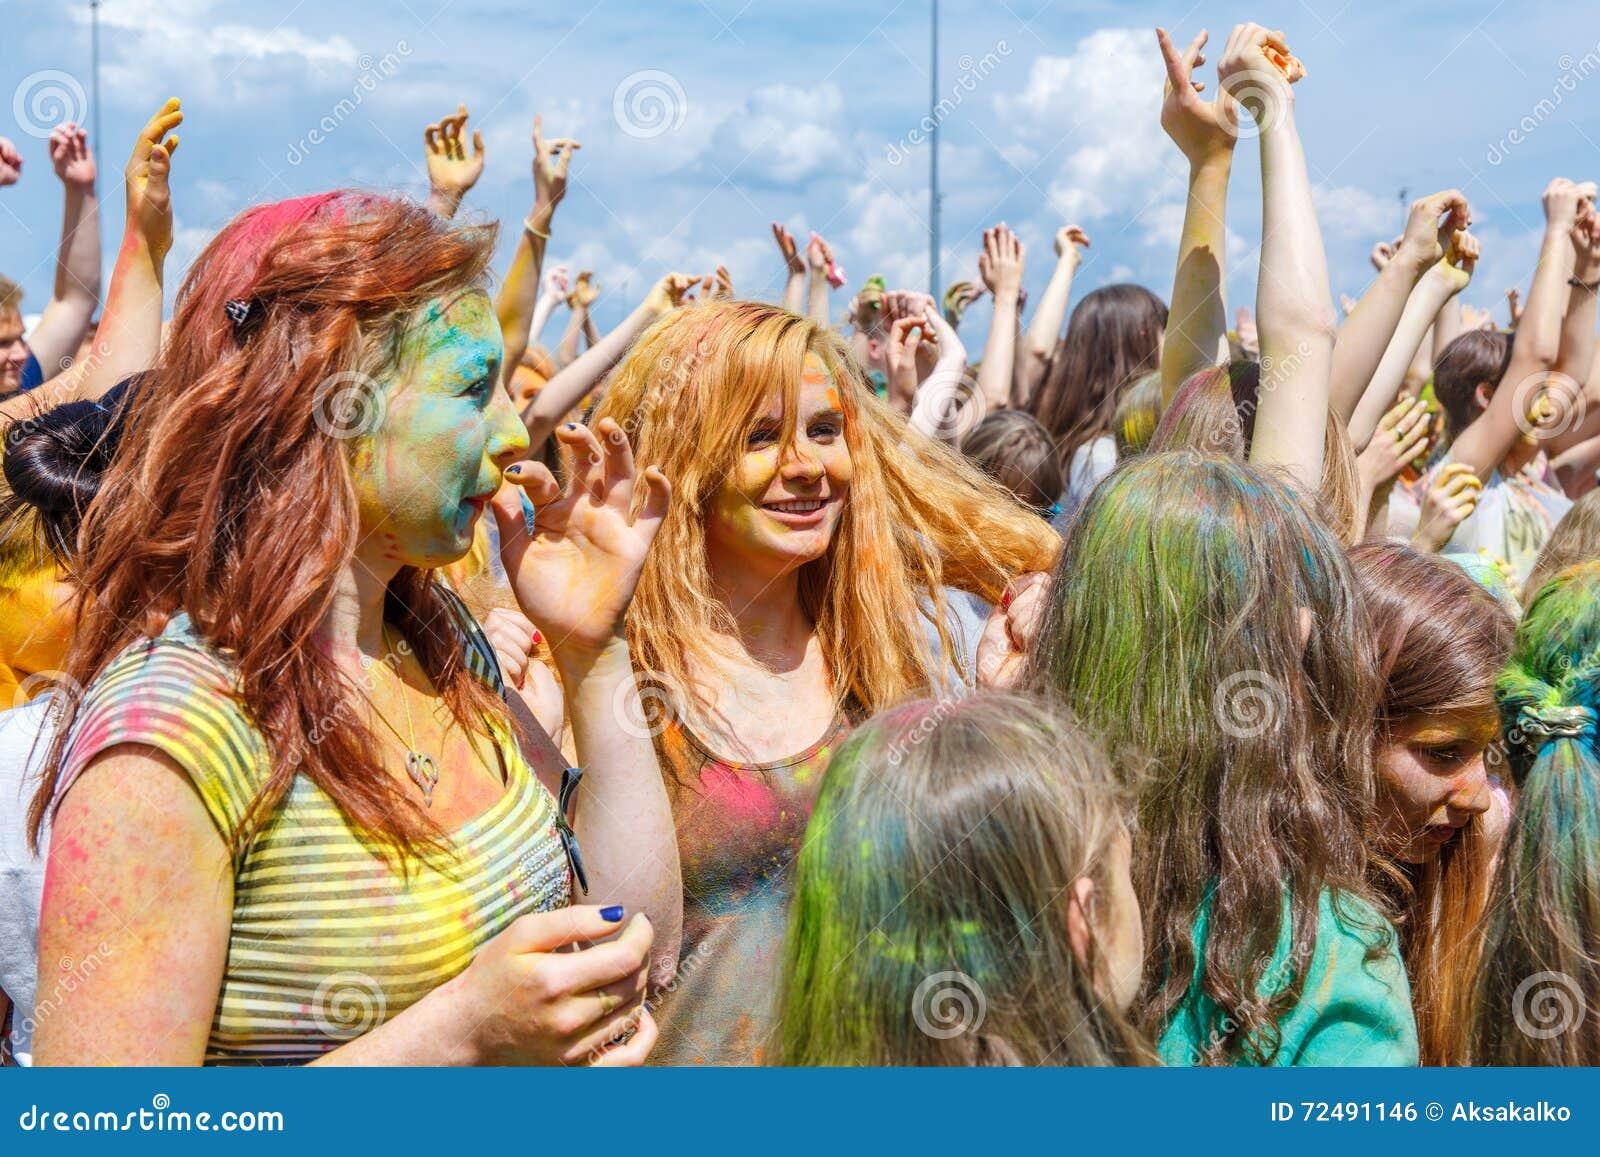 The annual festival of colors ColorFest